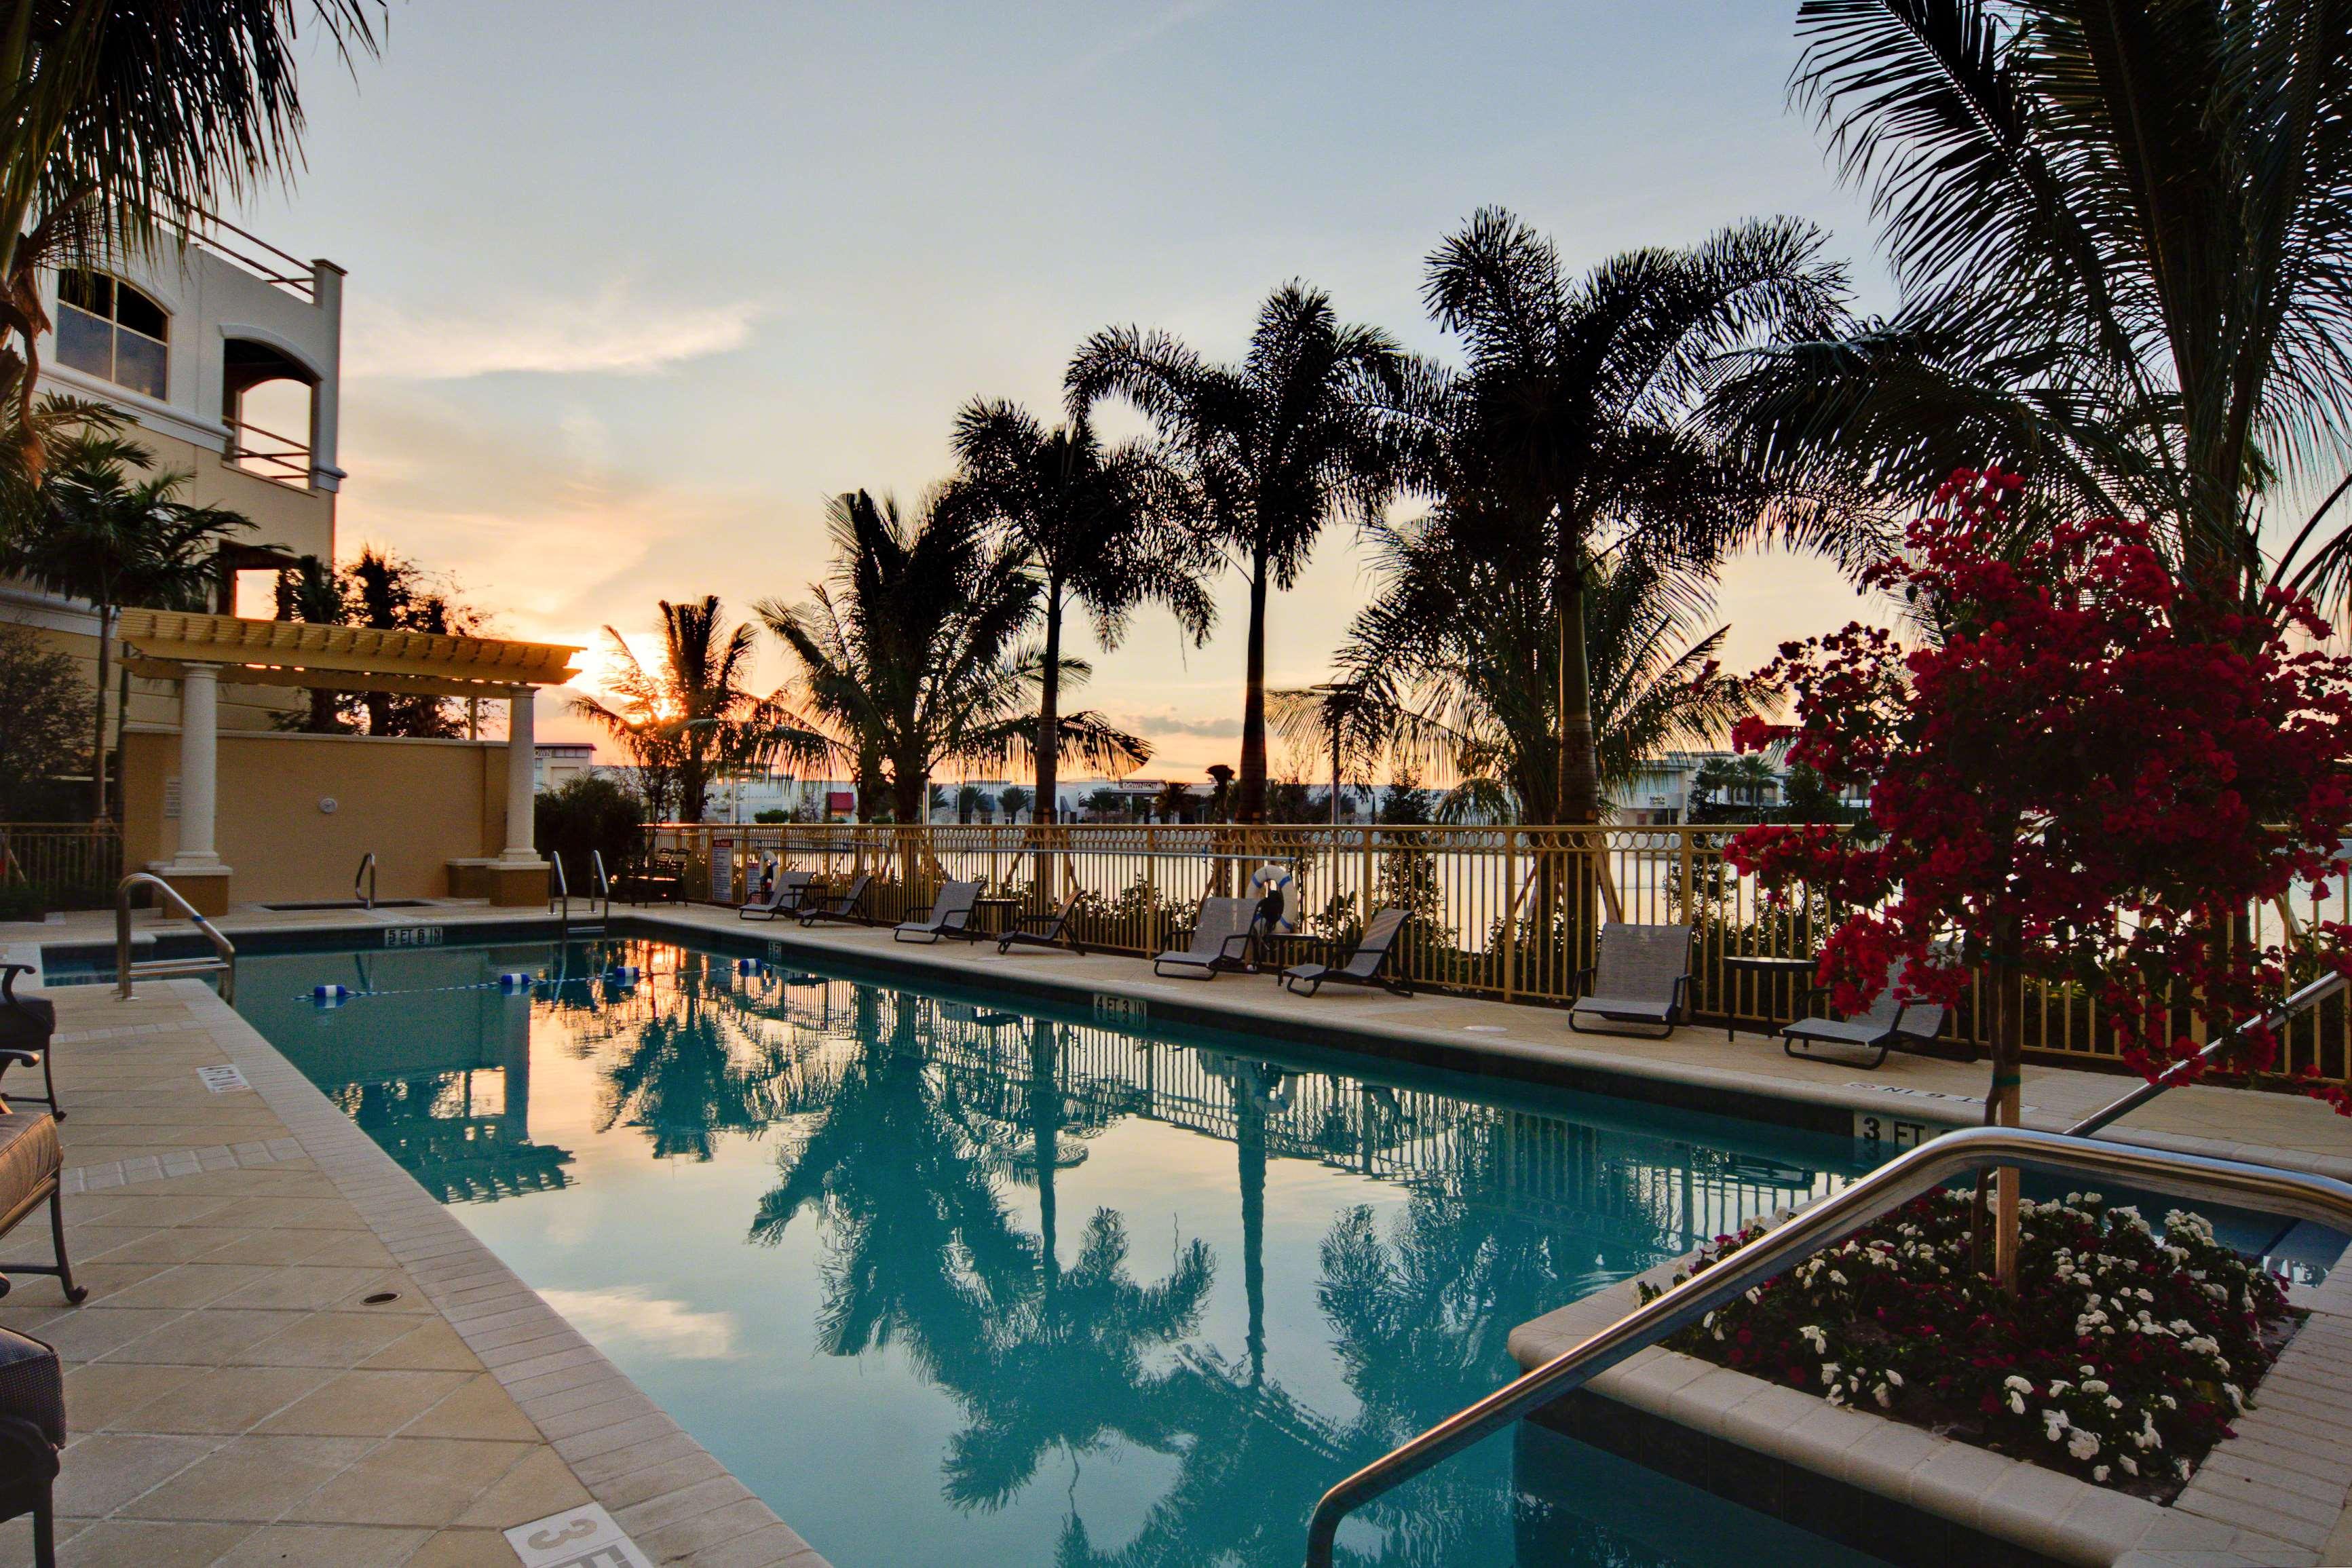 Hilton Garden Inn Palm Beach Gardens image 6